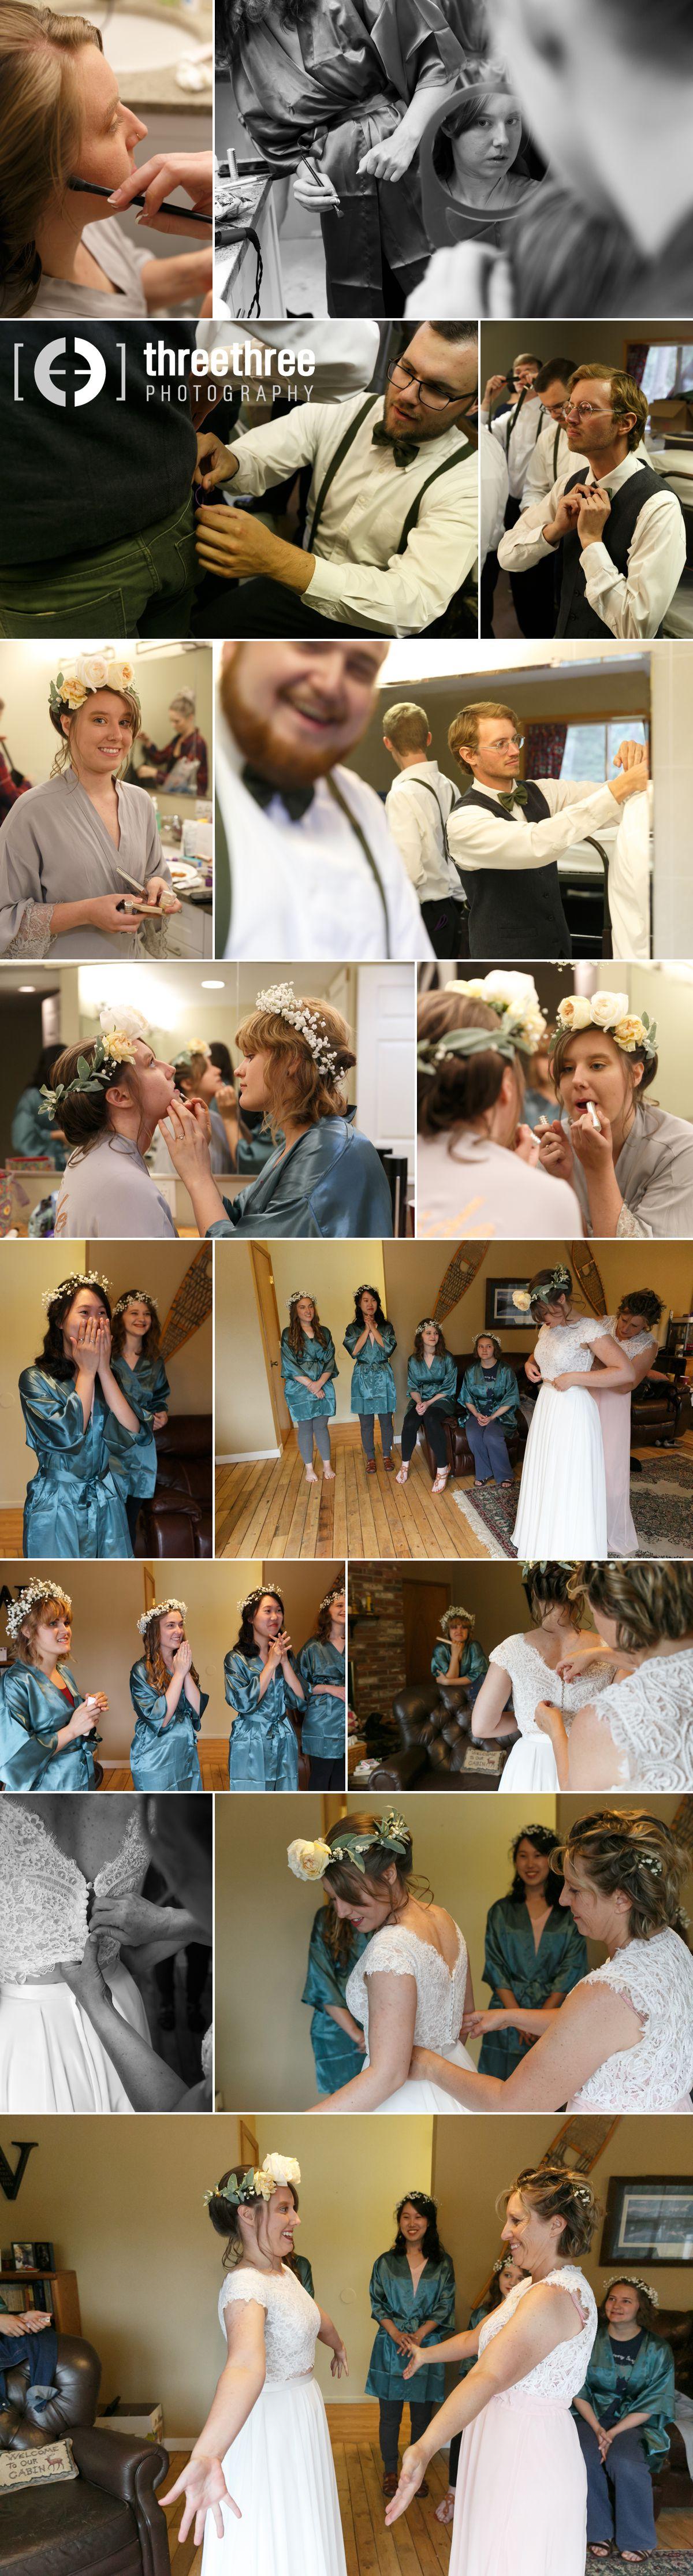 Kira Wedding Blog 2.jpg